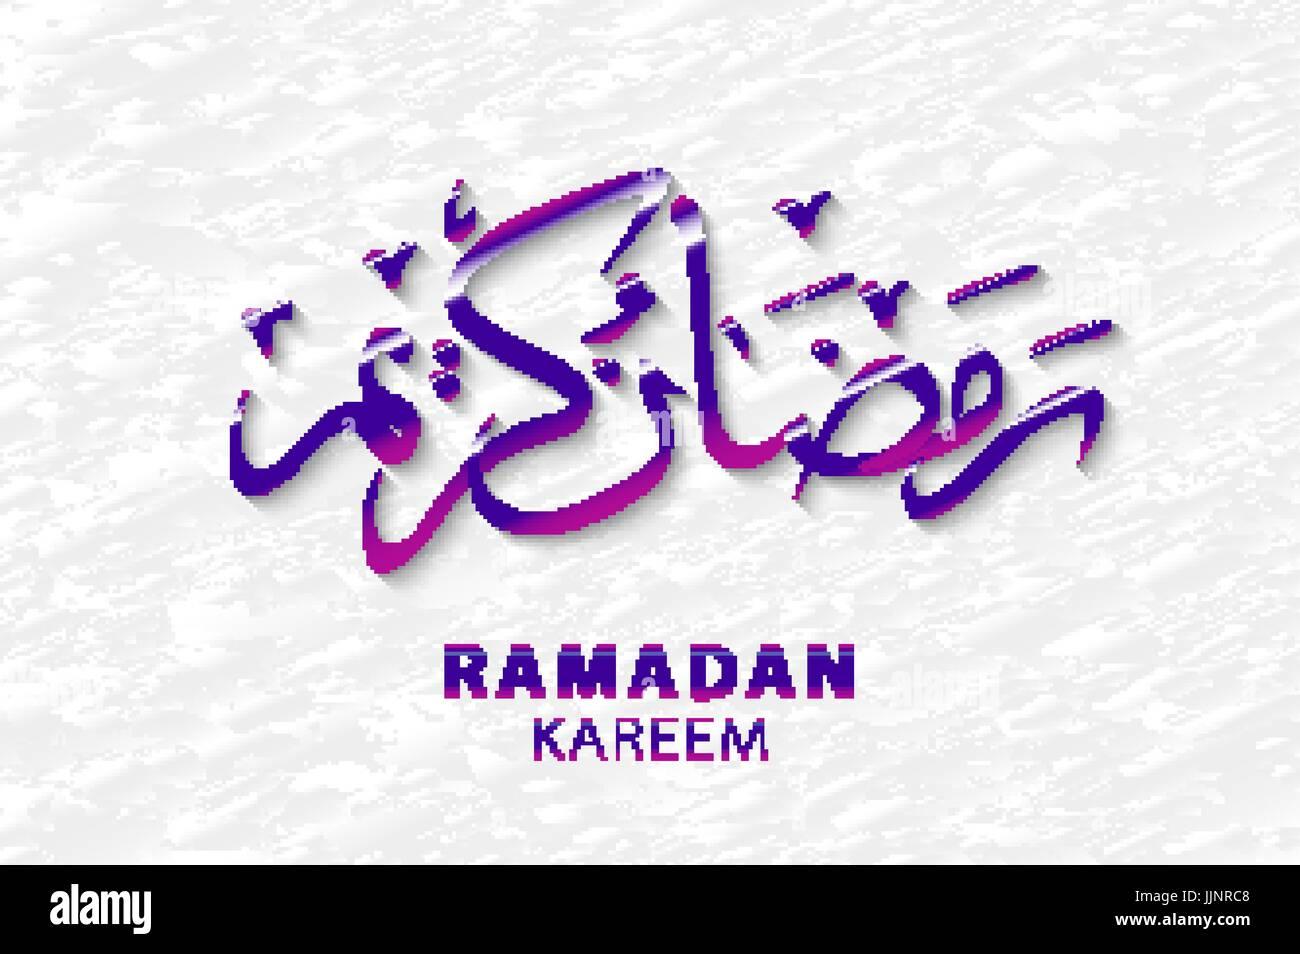 Ramadan kareem background vector ramadan greetings in arabic stock ramadan kareem background vector ramadan greetings in arabic script an islamic greeting card for holy month of ramadan kareem translation generous m4hsunfo